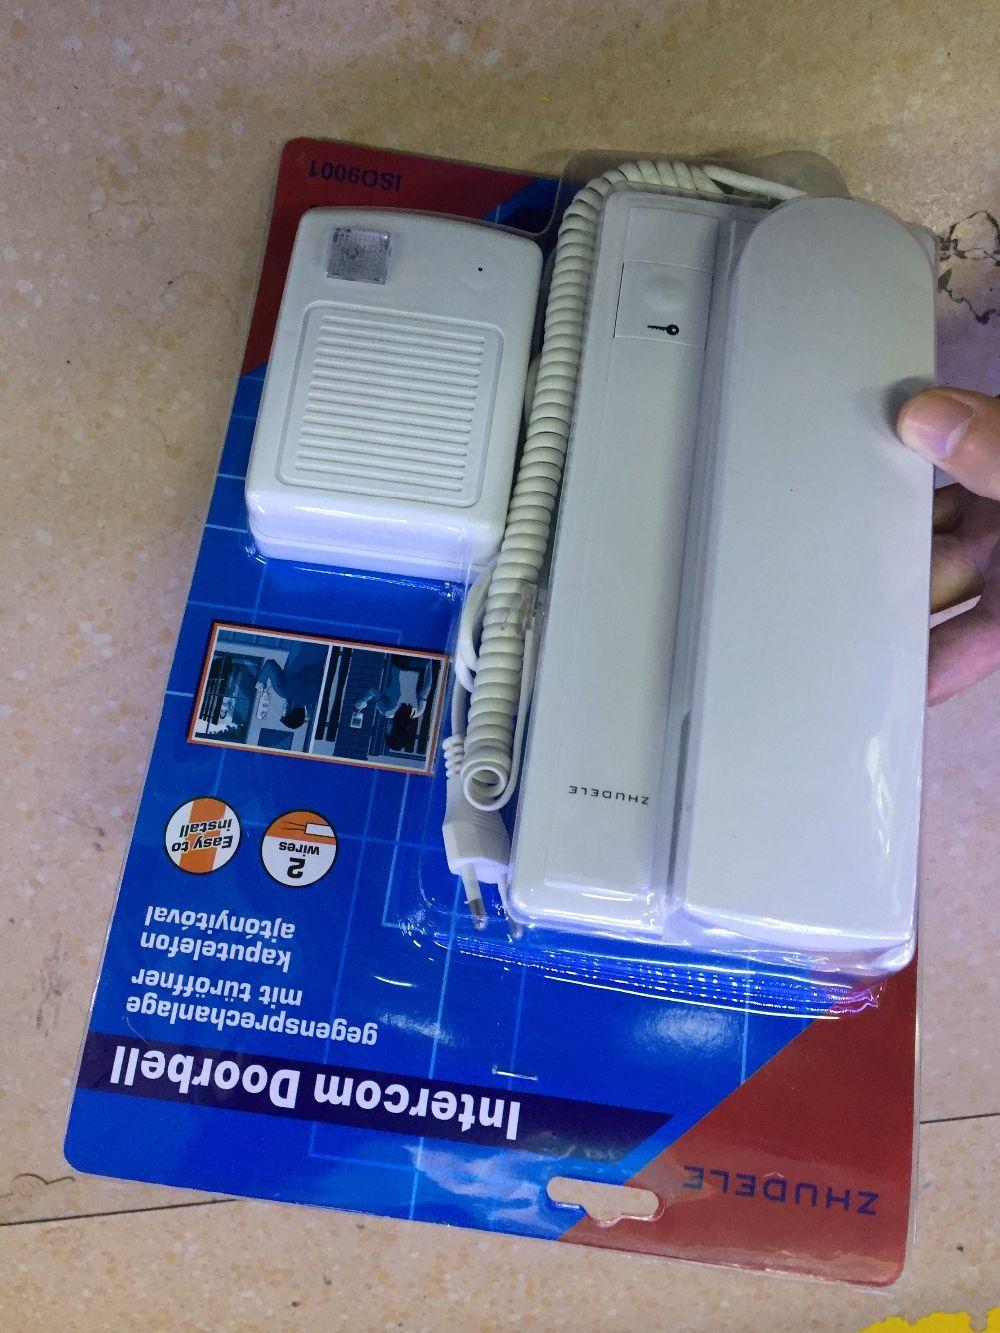 Audio Lntercom Doorbell House Door Entry Intercom System Security